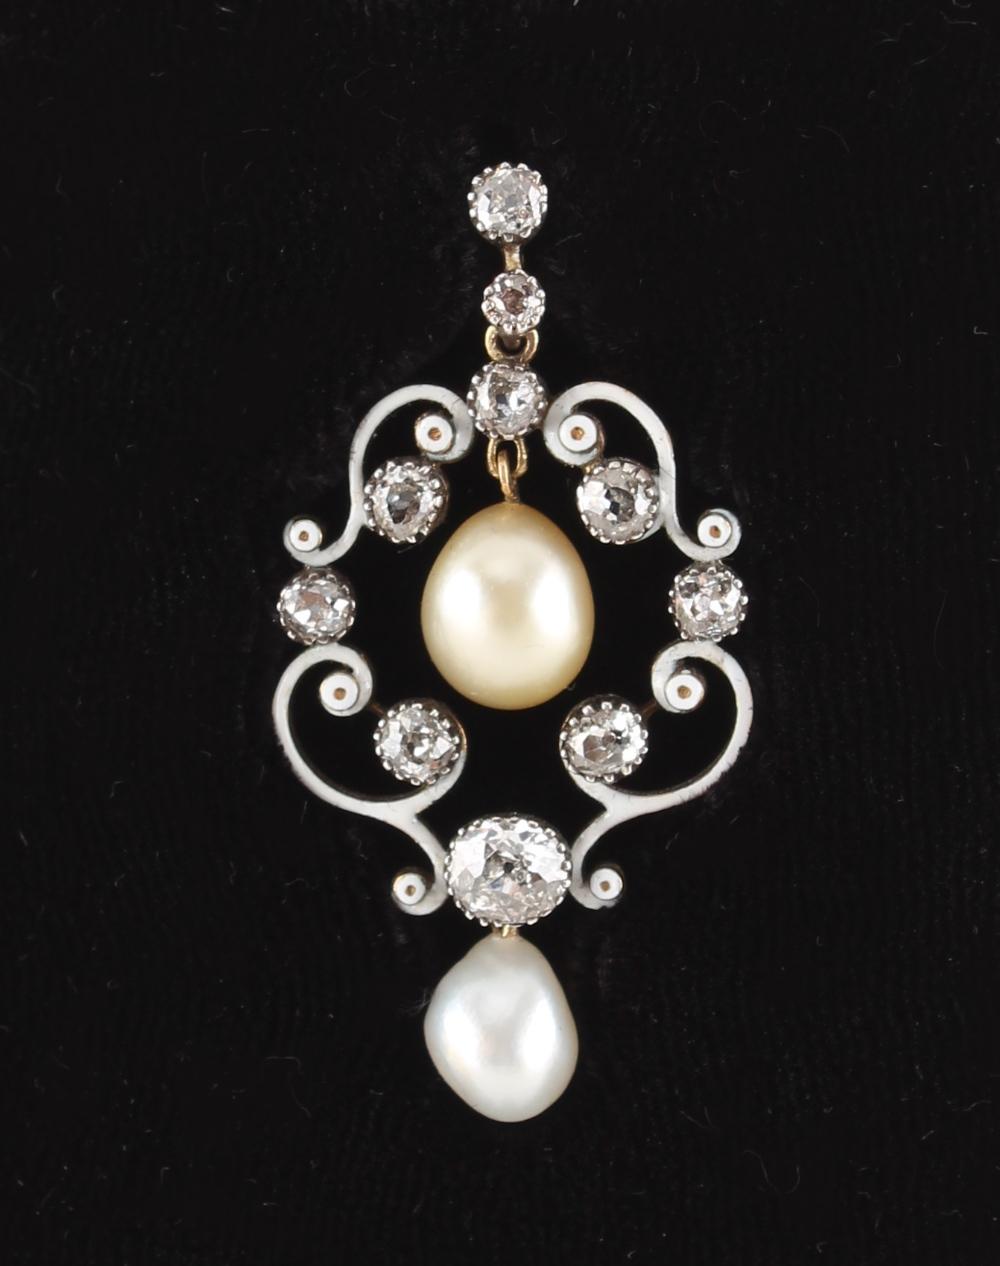 An antique natural saltwater pearl diamond & white enamel pendant, the white enamelled scroll